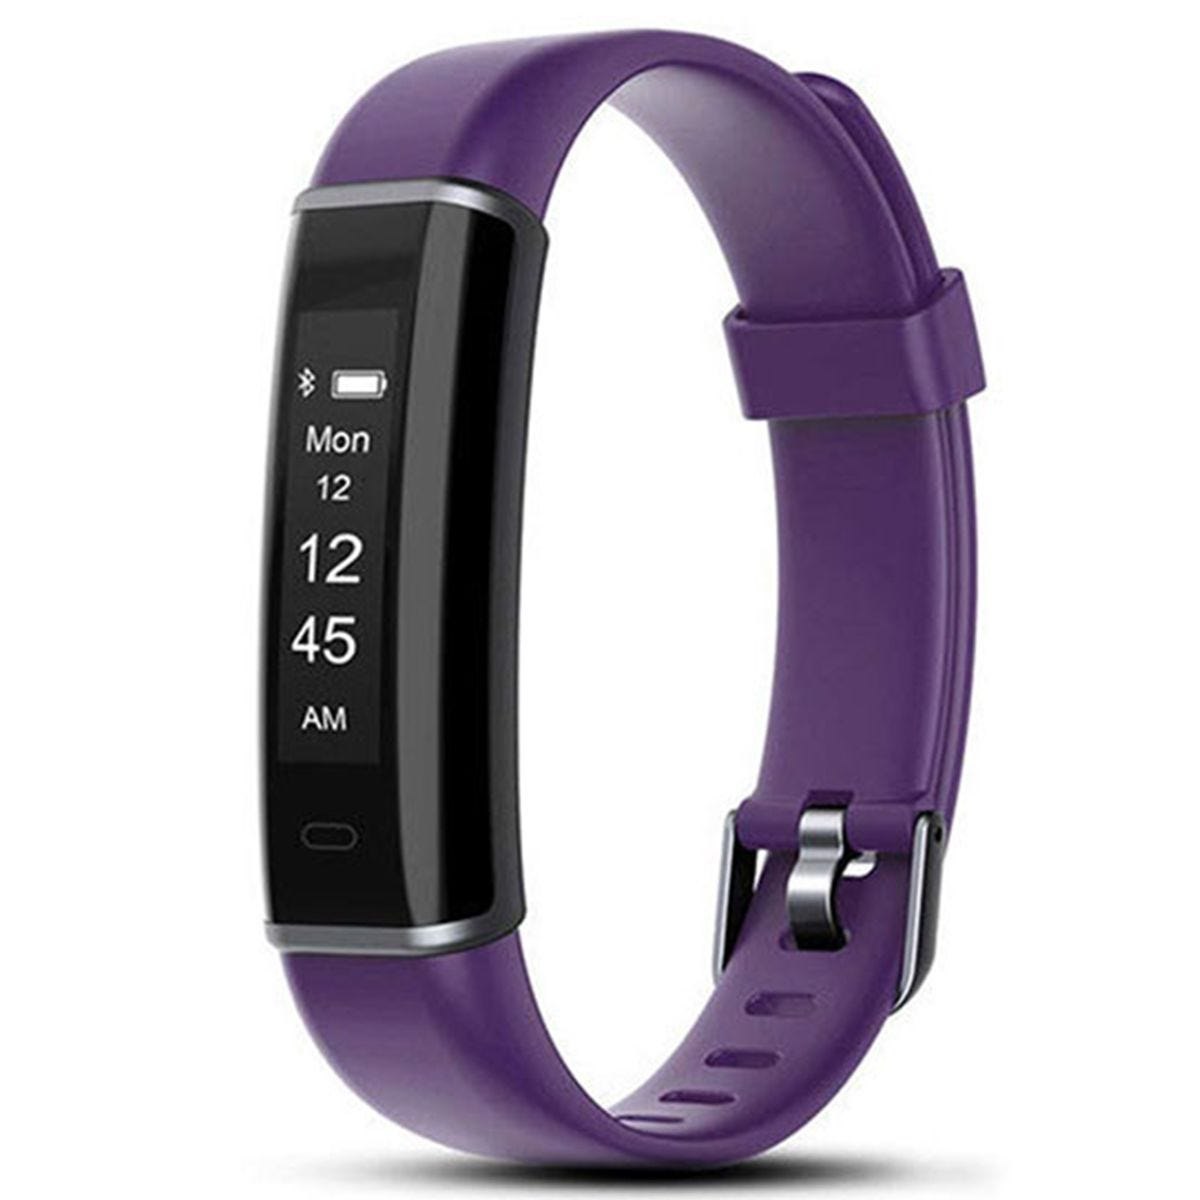 Aquarius AQ113HR Fitness Tracker With Heart Rate Monitor - Purple